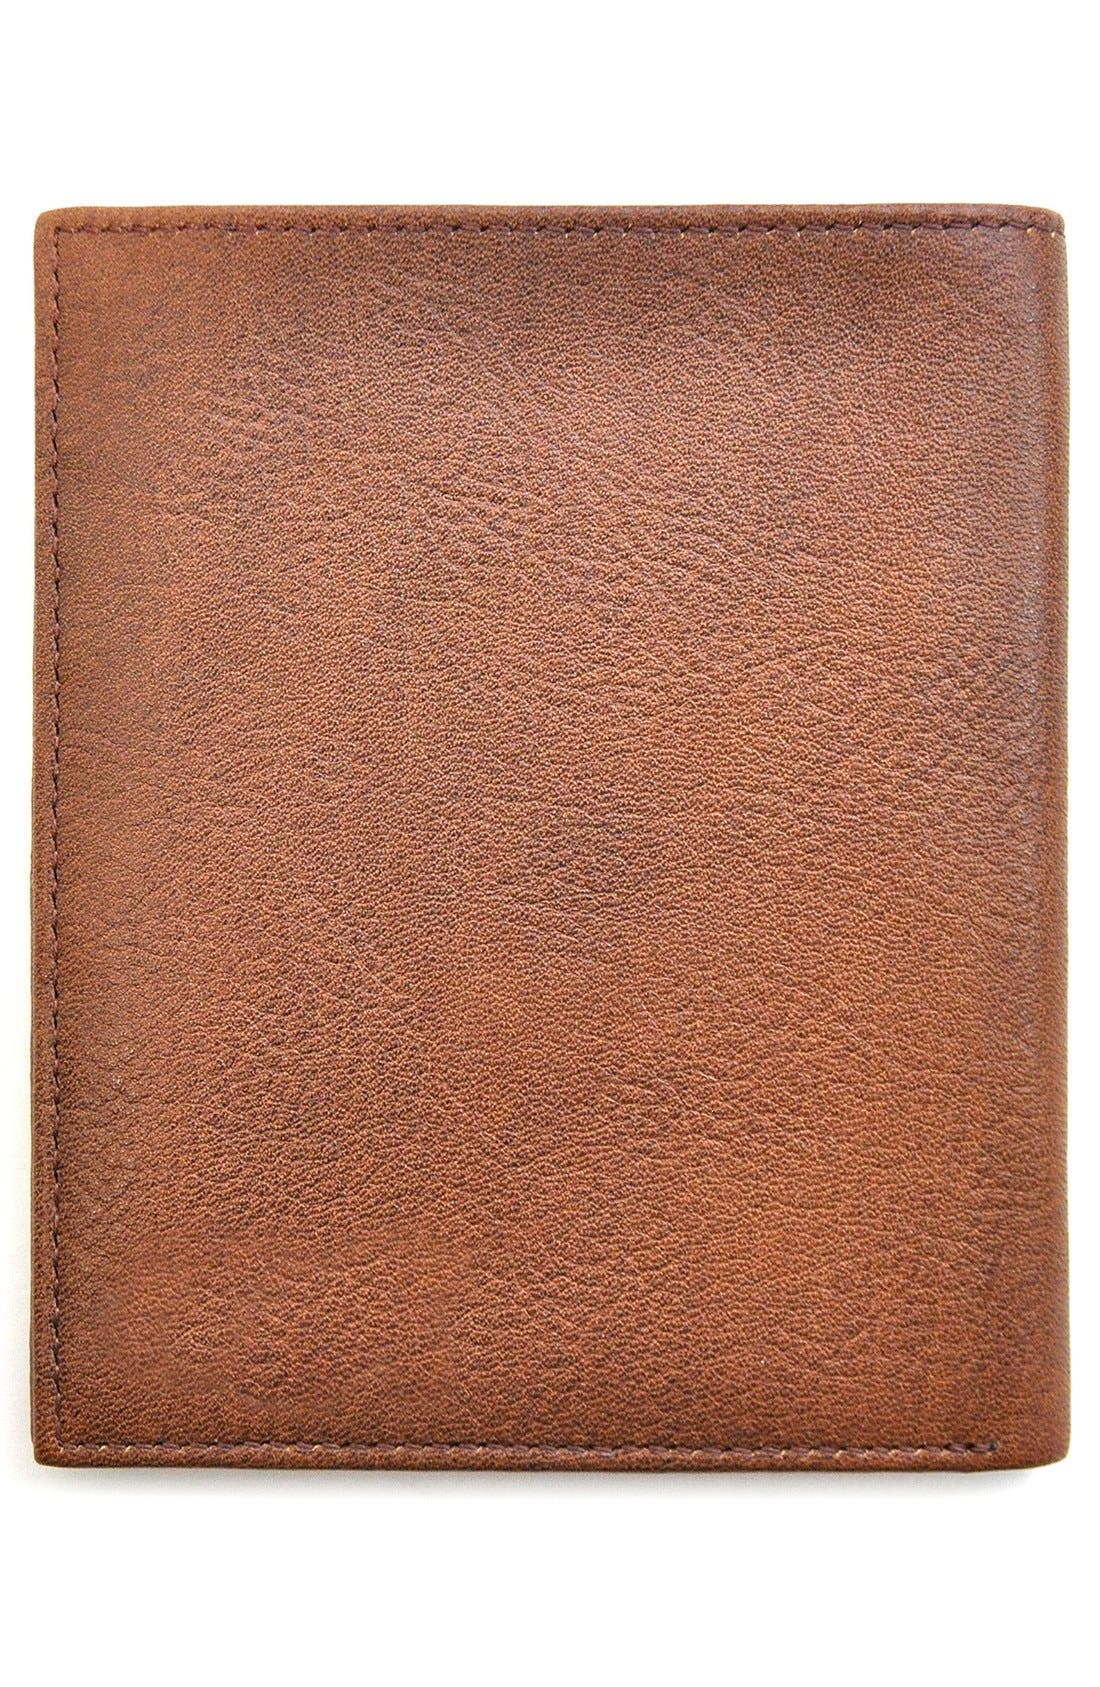 Triple Play Leather Executive Wallet,                             Alternate thumbnail 3, color,                             Cognac